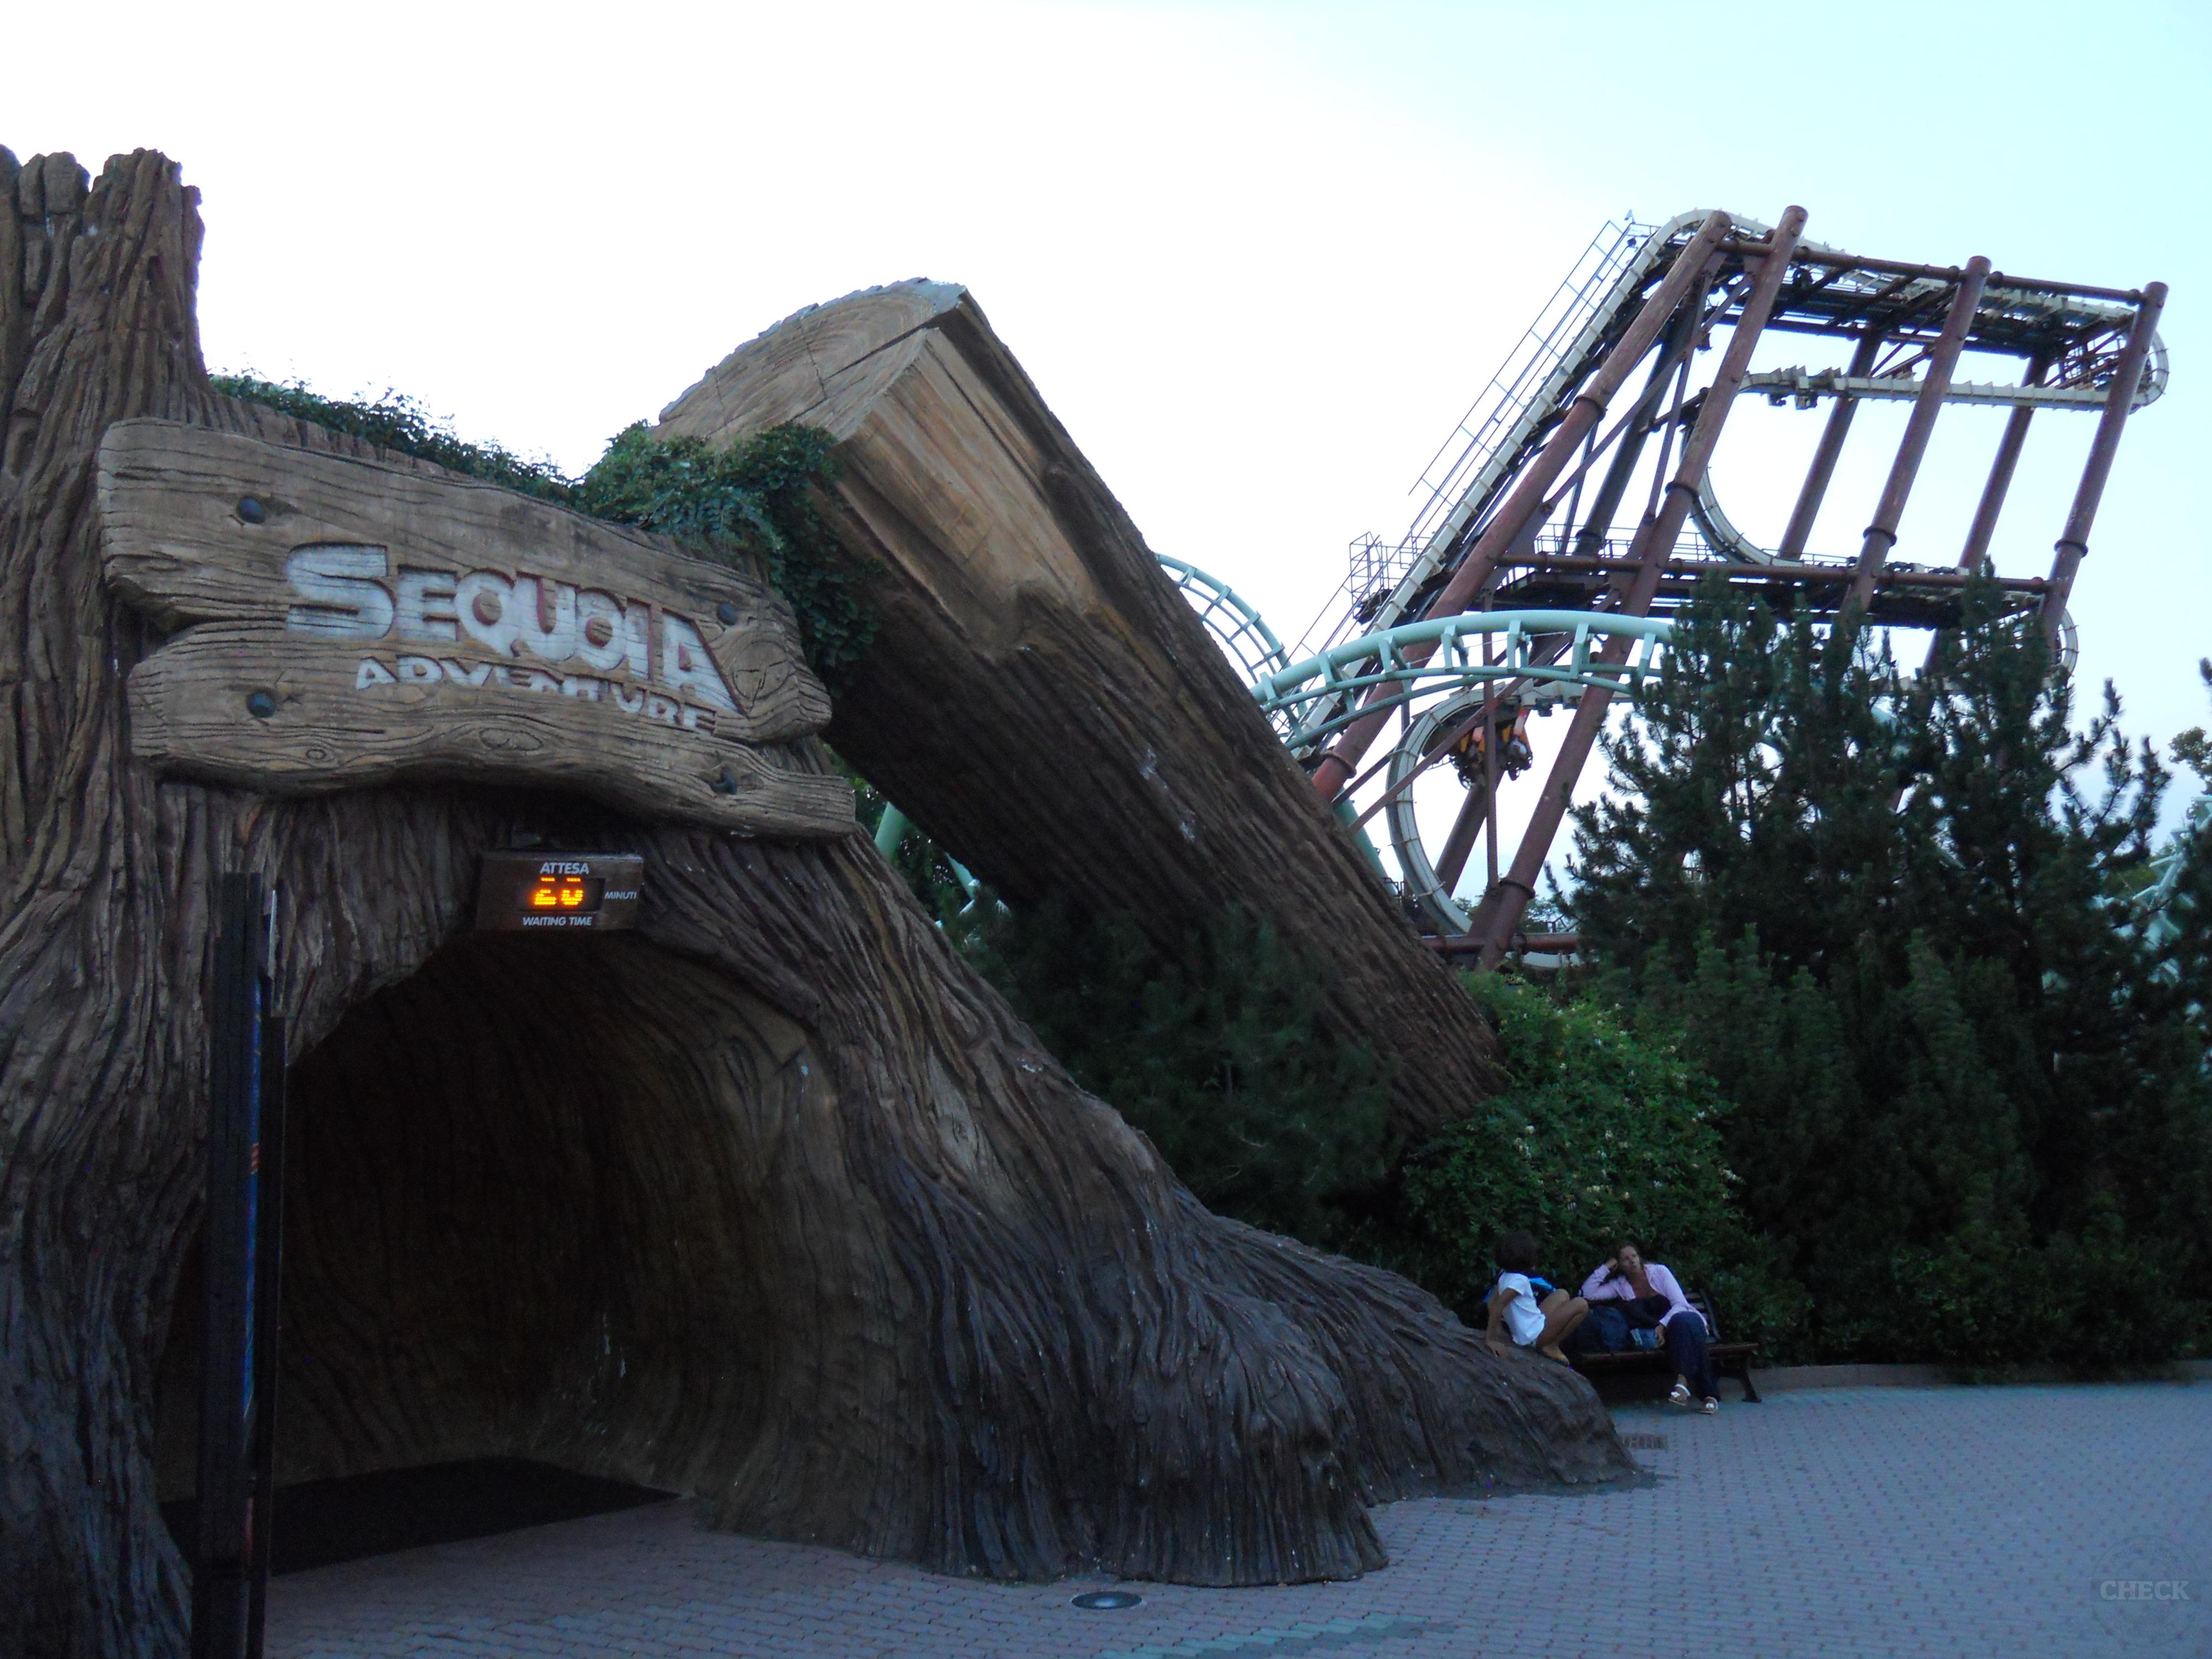 Sequioa Adventure